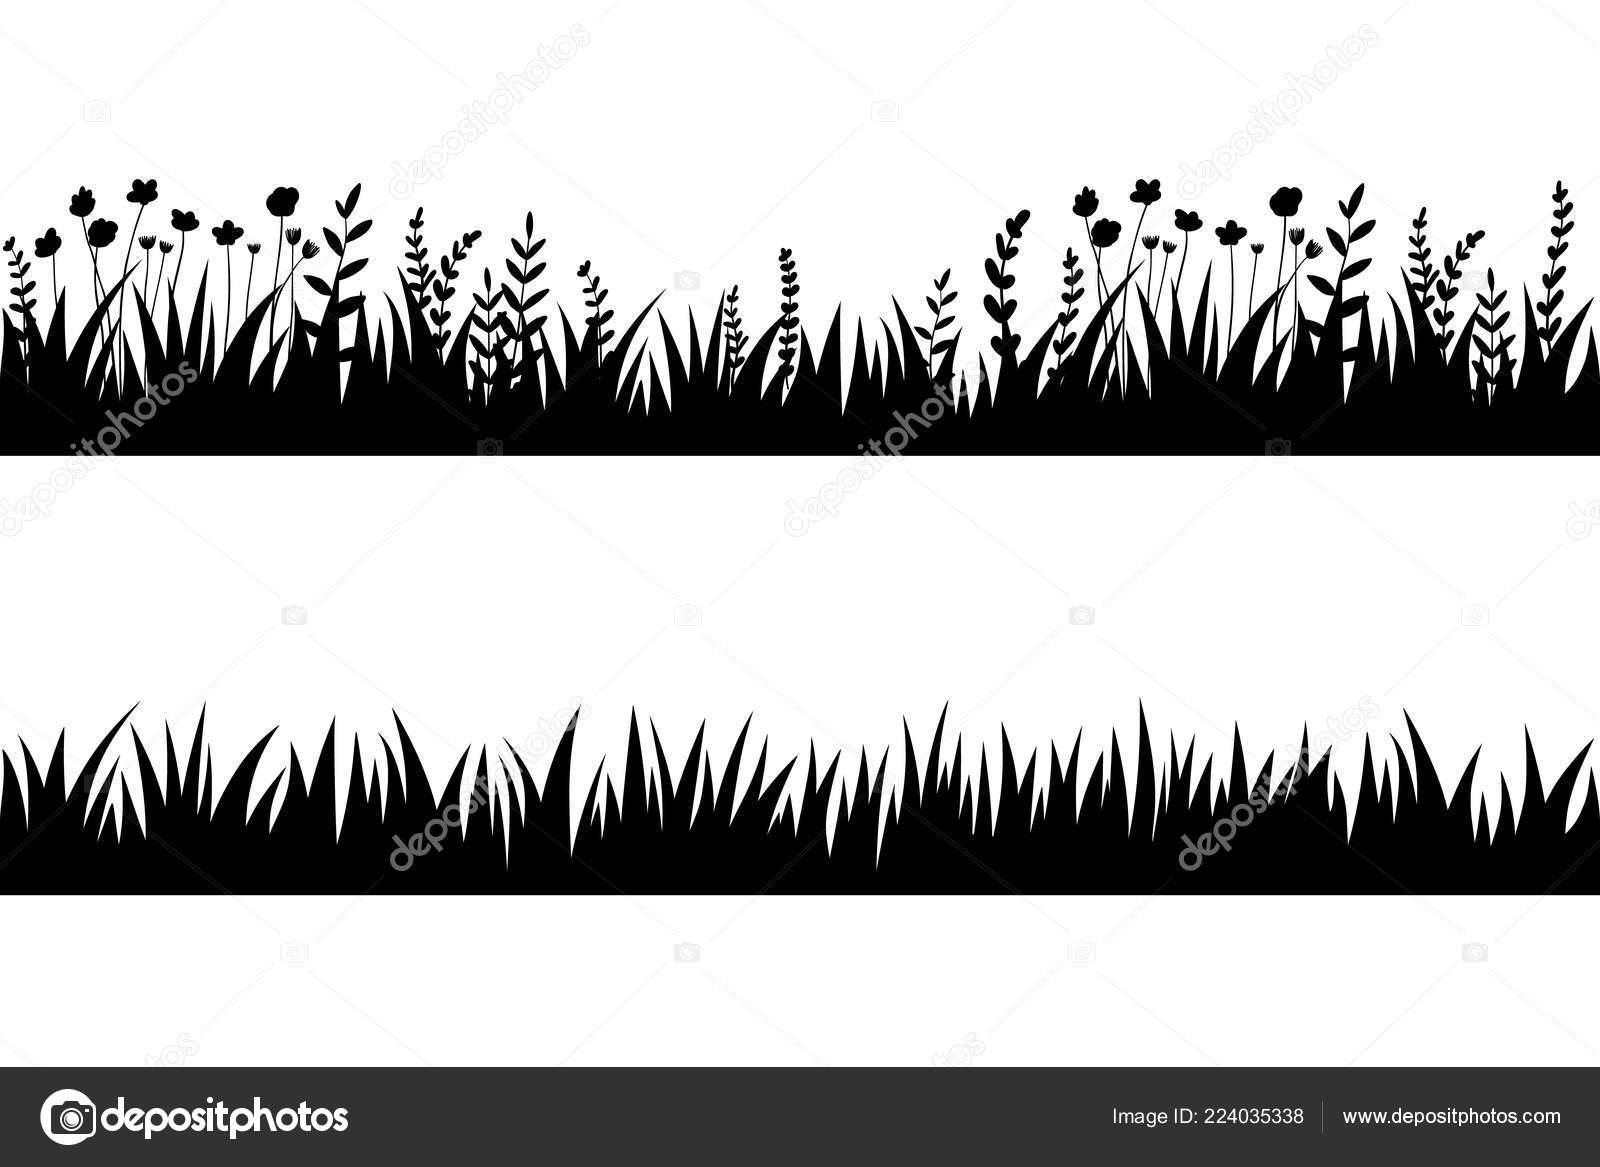 vector black grass natural organic bio eco label shape white stock vector c natakuprova 224035338 https depositphotos com 224035338 stock illustration vector black grass natural organic html